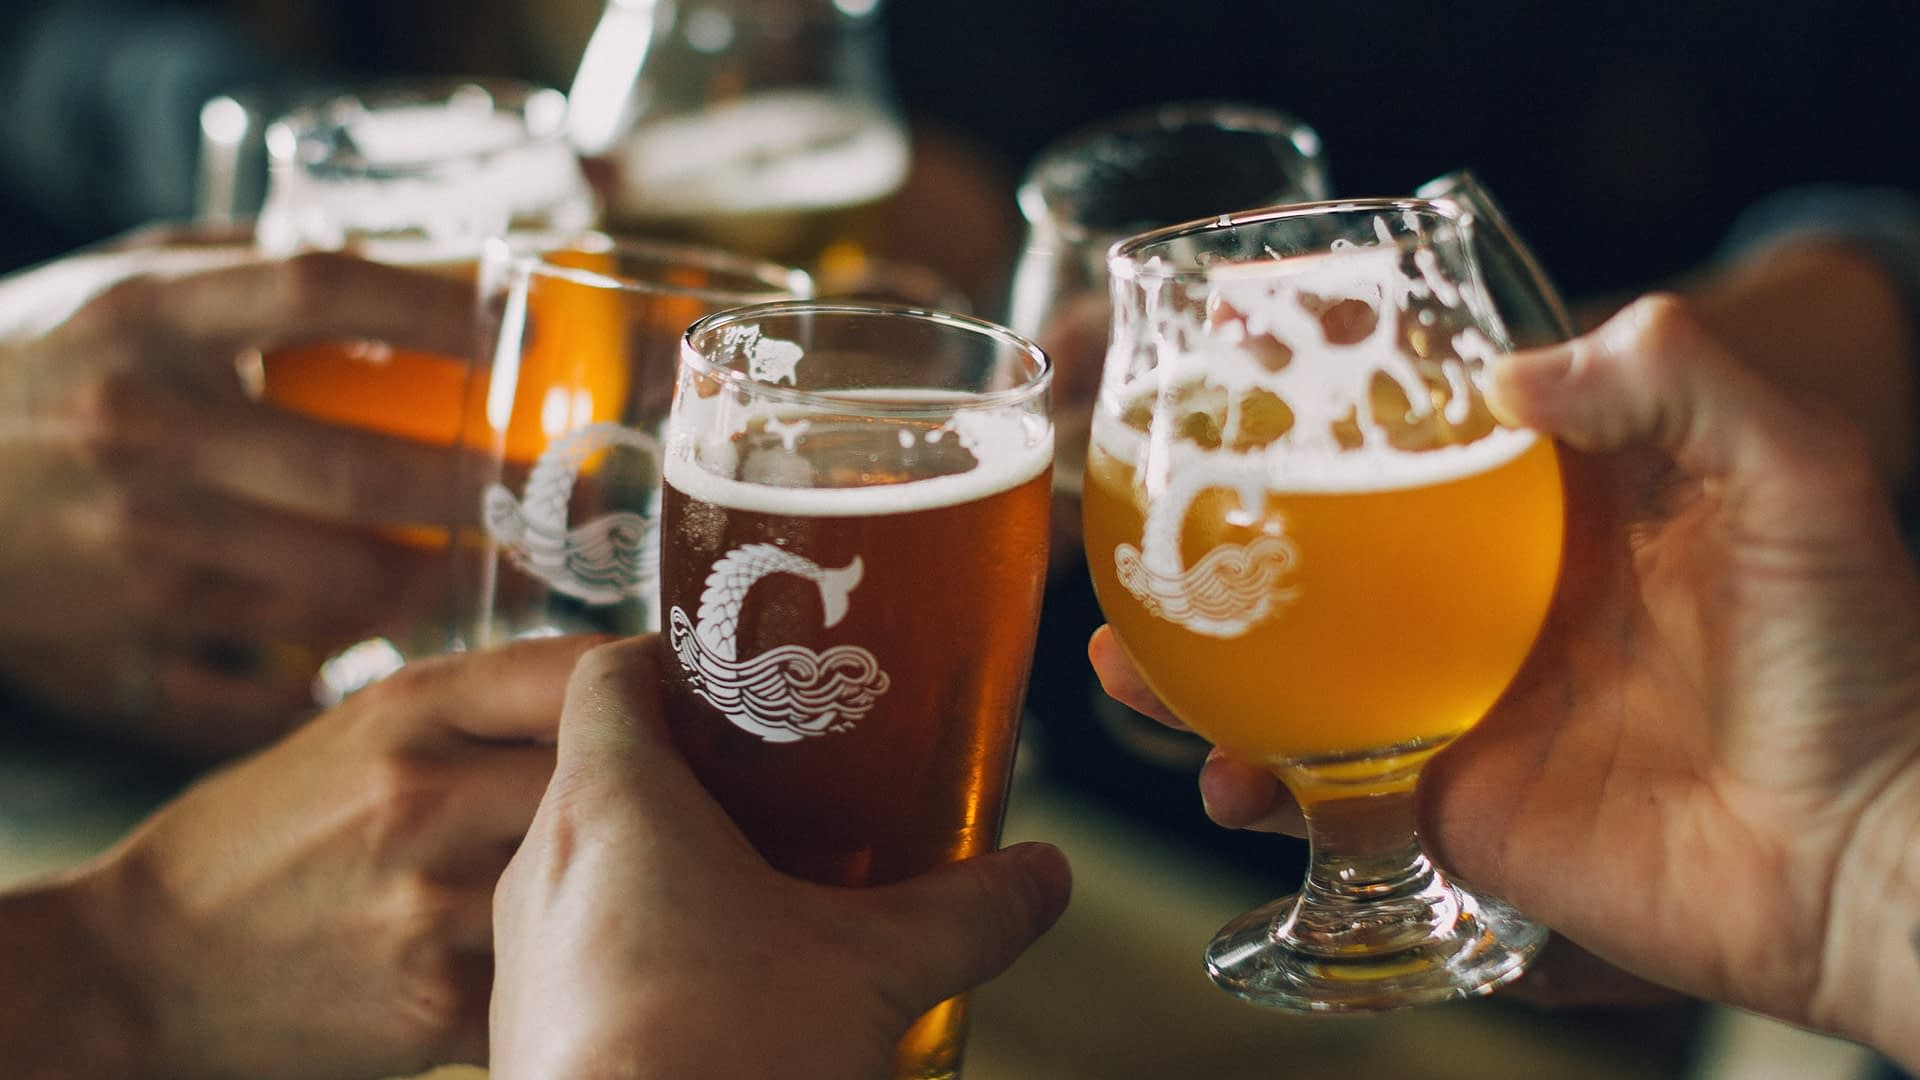 Coppertail beer in branded glasses